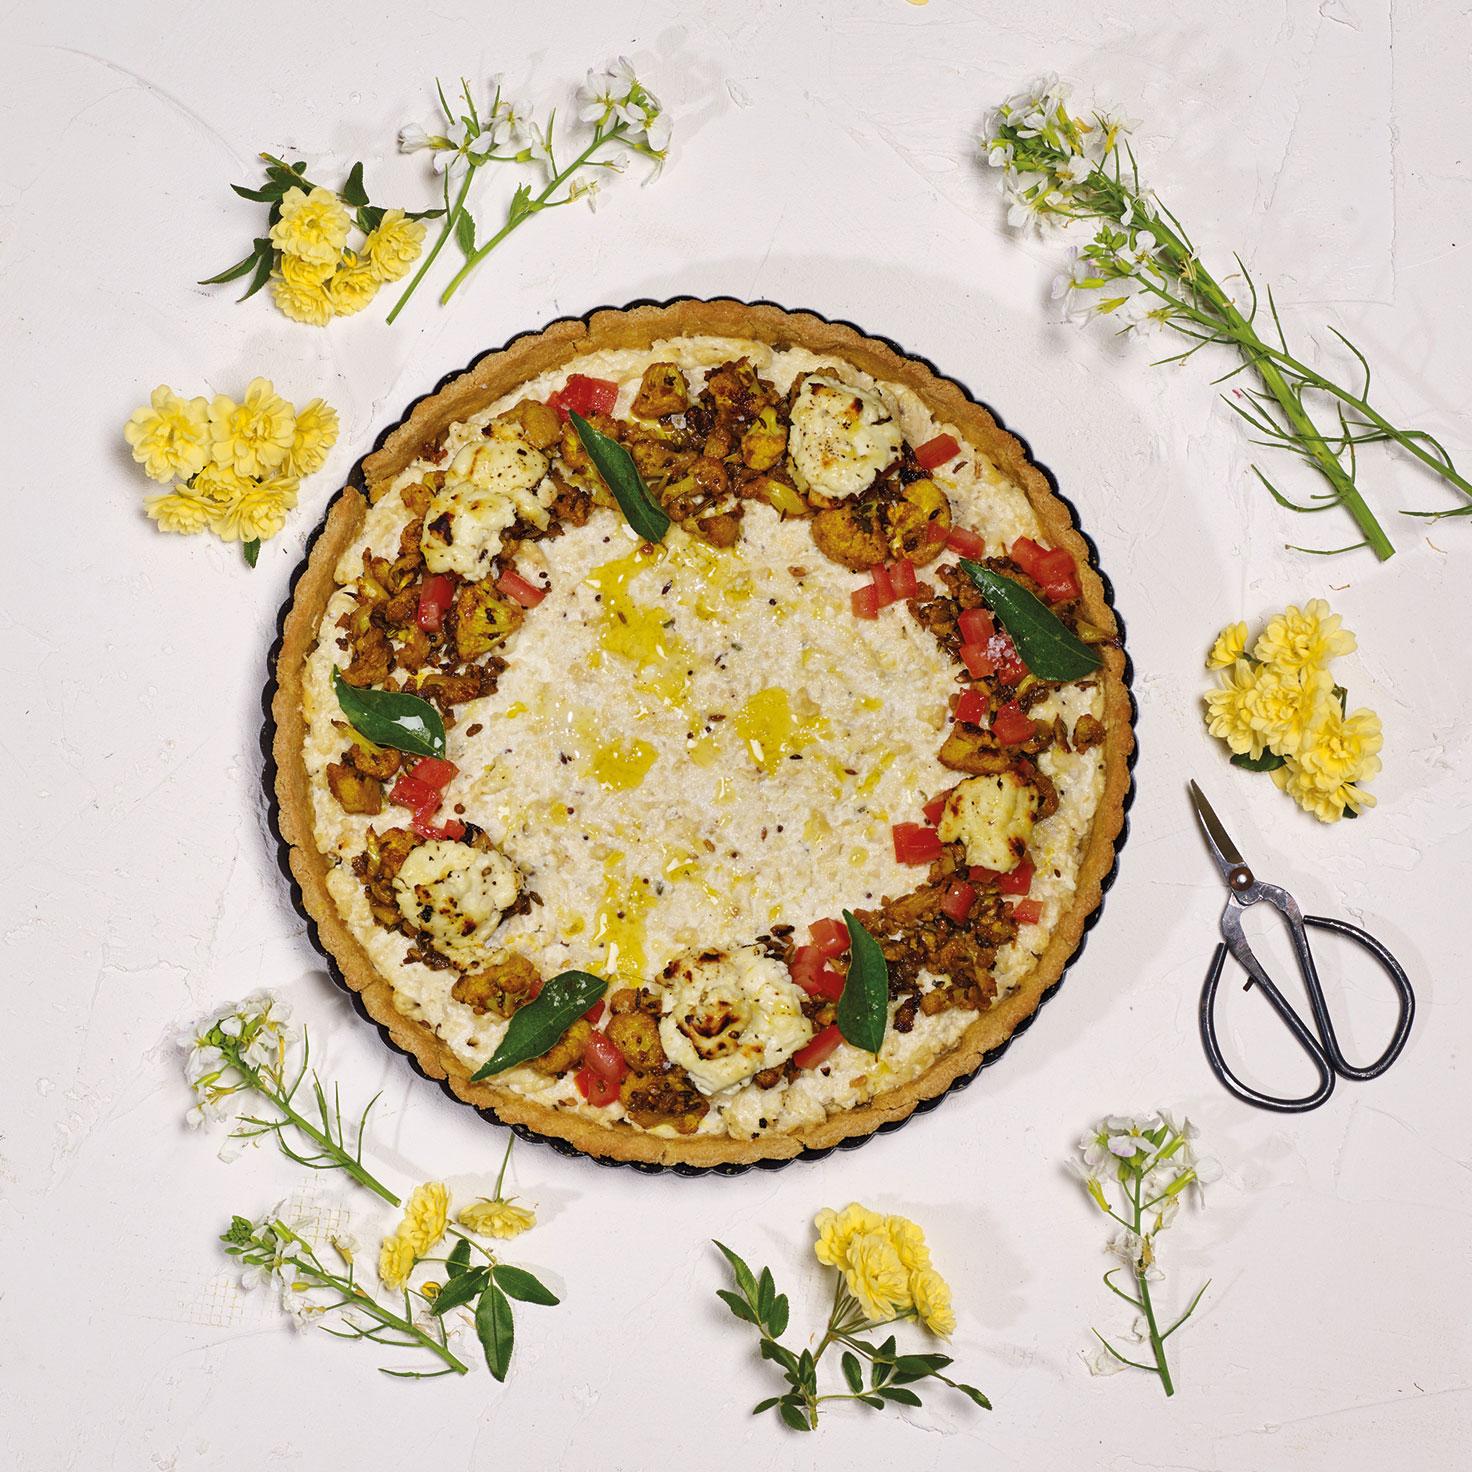 Summer Recipe: Spiced Cauliflower & Quark Tart